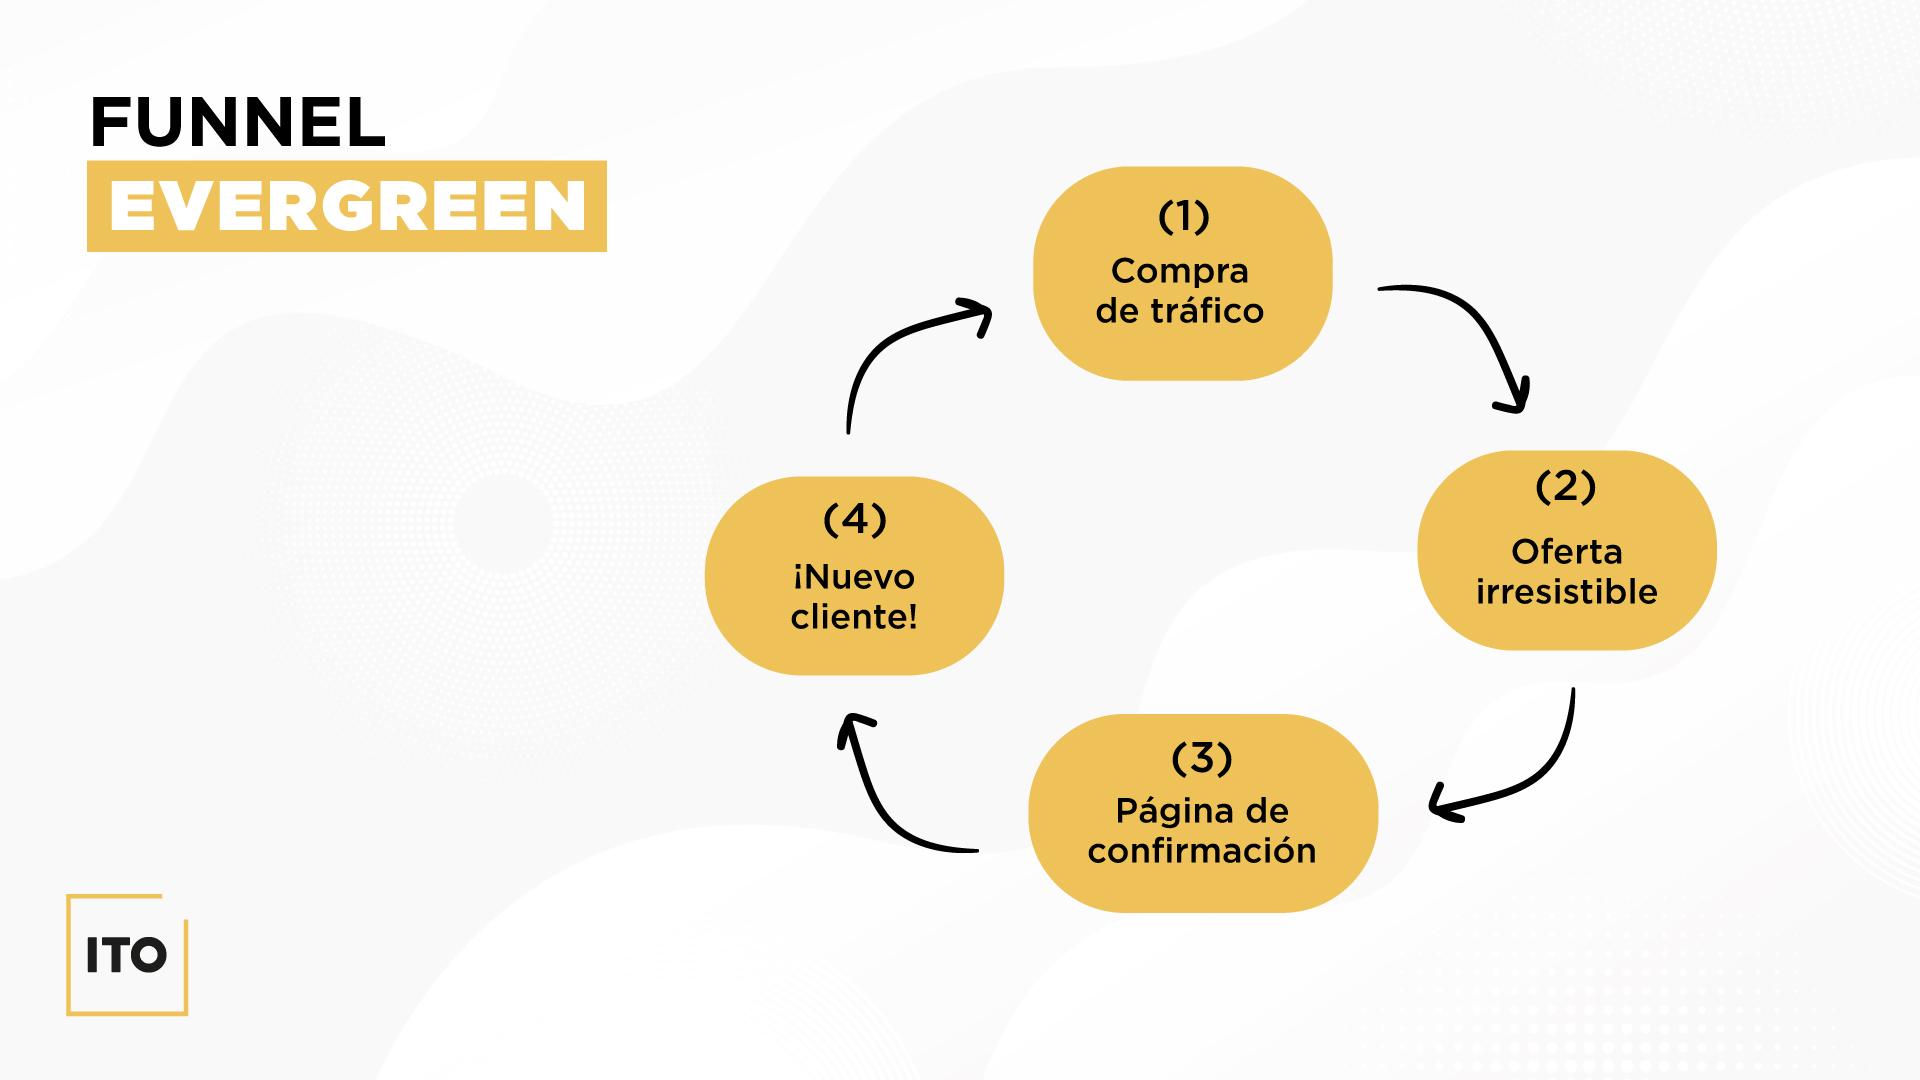 Funnels de ventas evergreen para el post de ITO